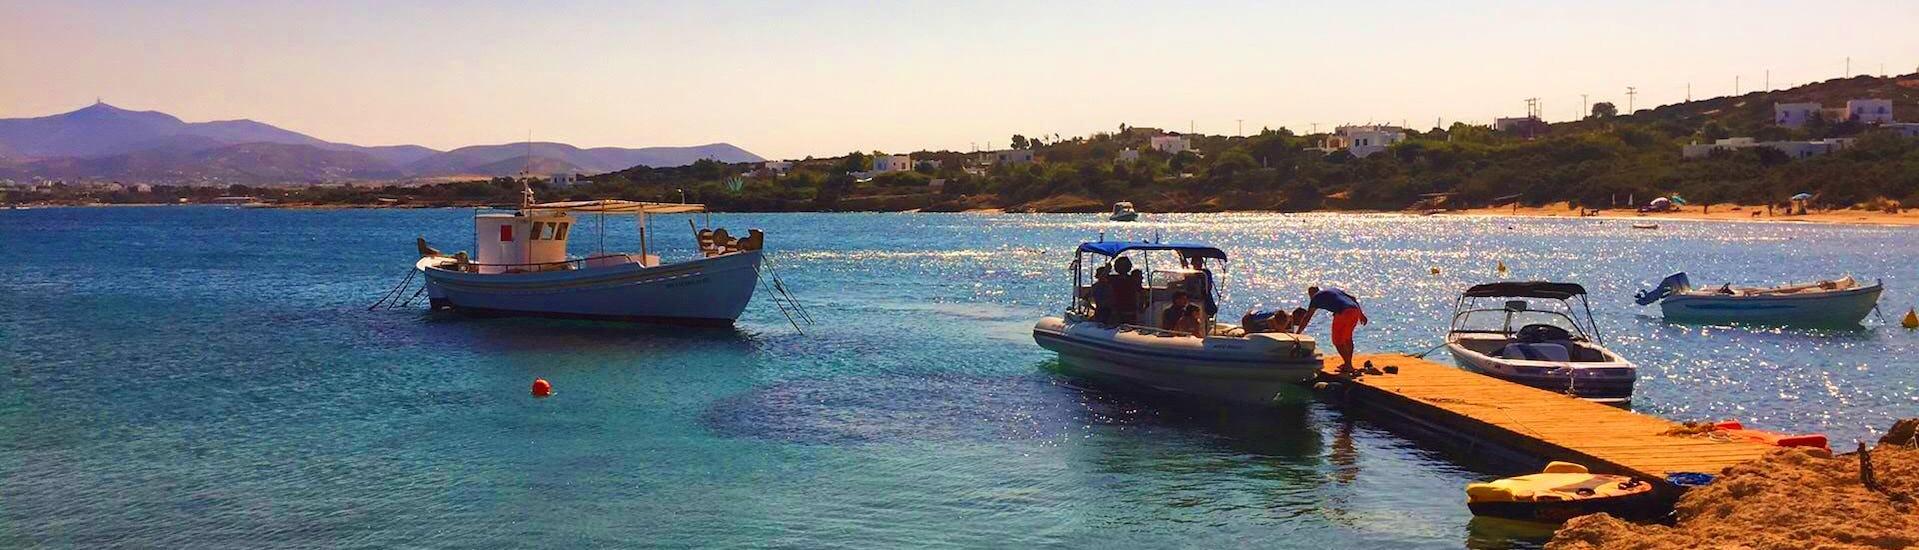 lagoon-and-antiparos-boat-tour-in-paros-g3-boats